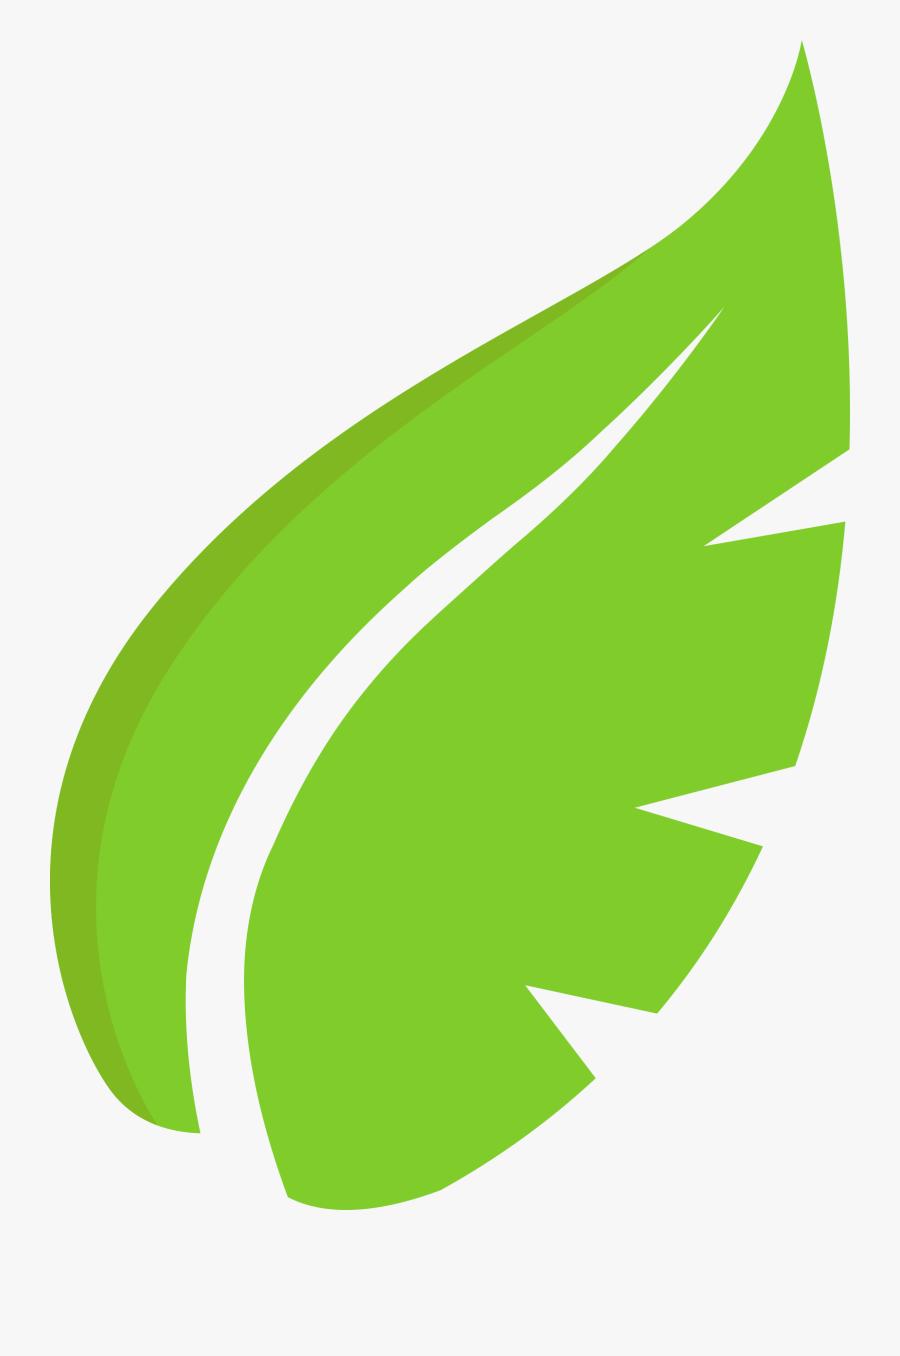 Hoja De Arbol Logo , Png Download - Green Leaf Draw Png, Transparent Clipart